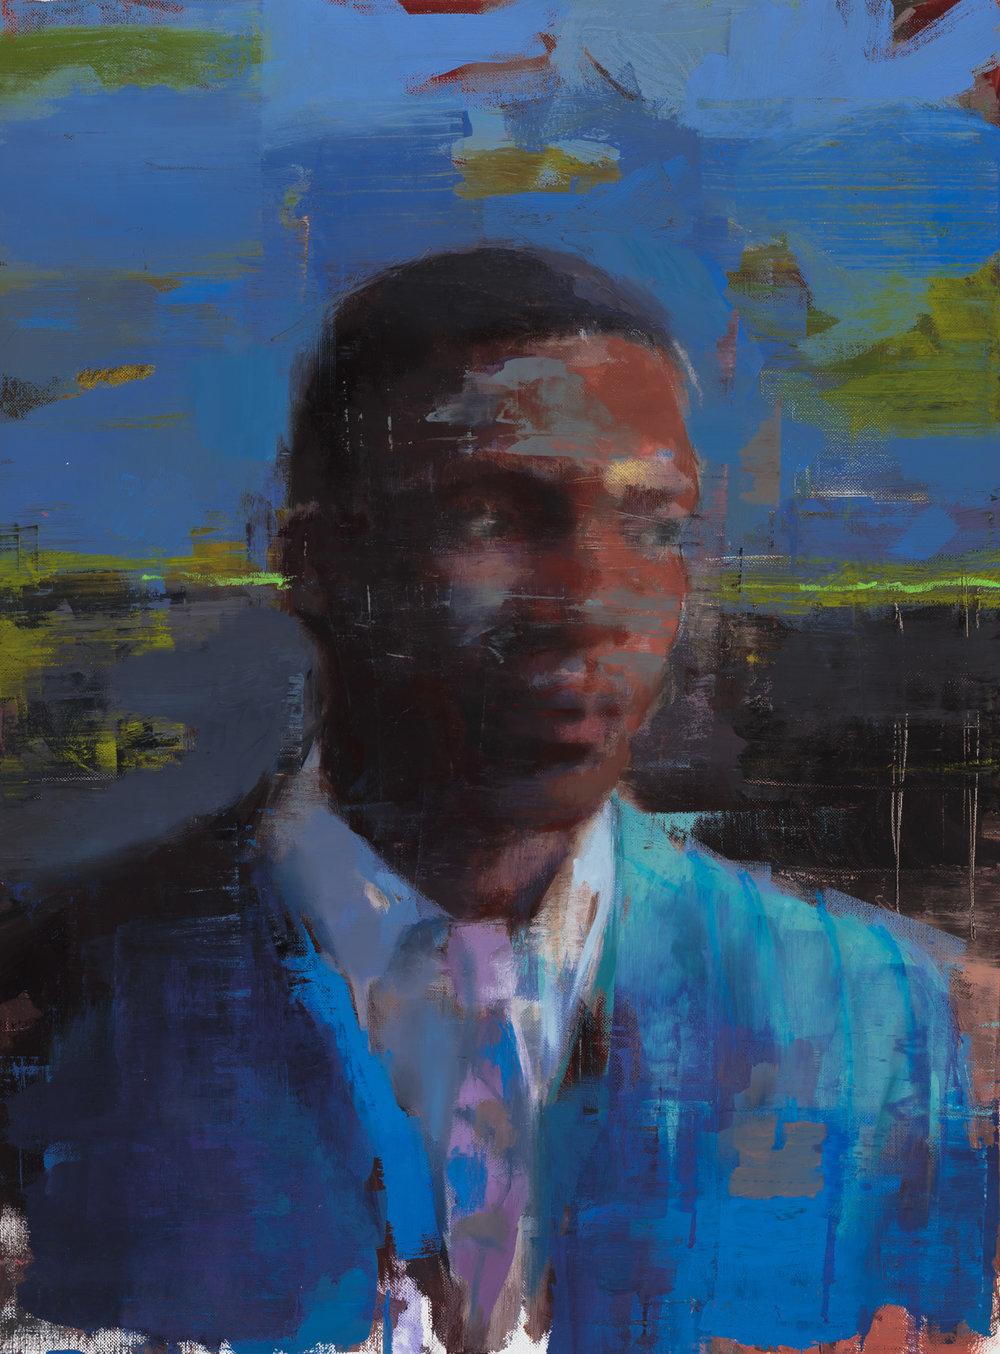 """ Young Coltrane  2018, 30"" x 21"" (73 x 54 cm), oil on linen."